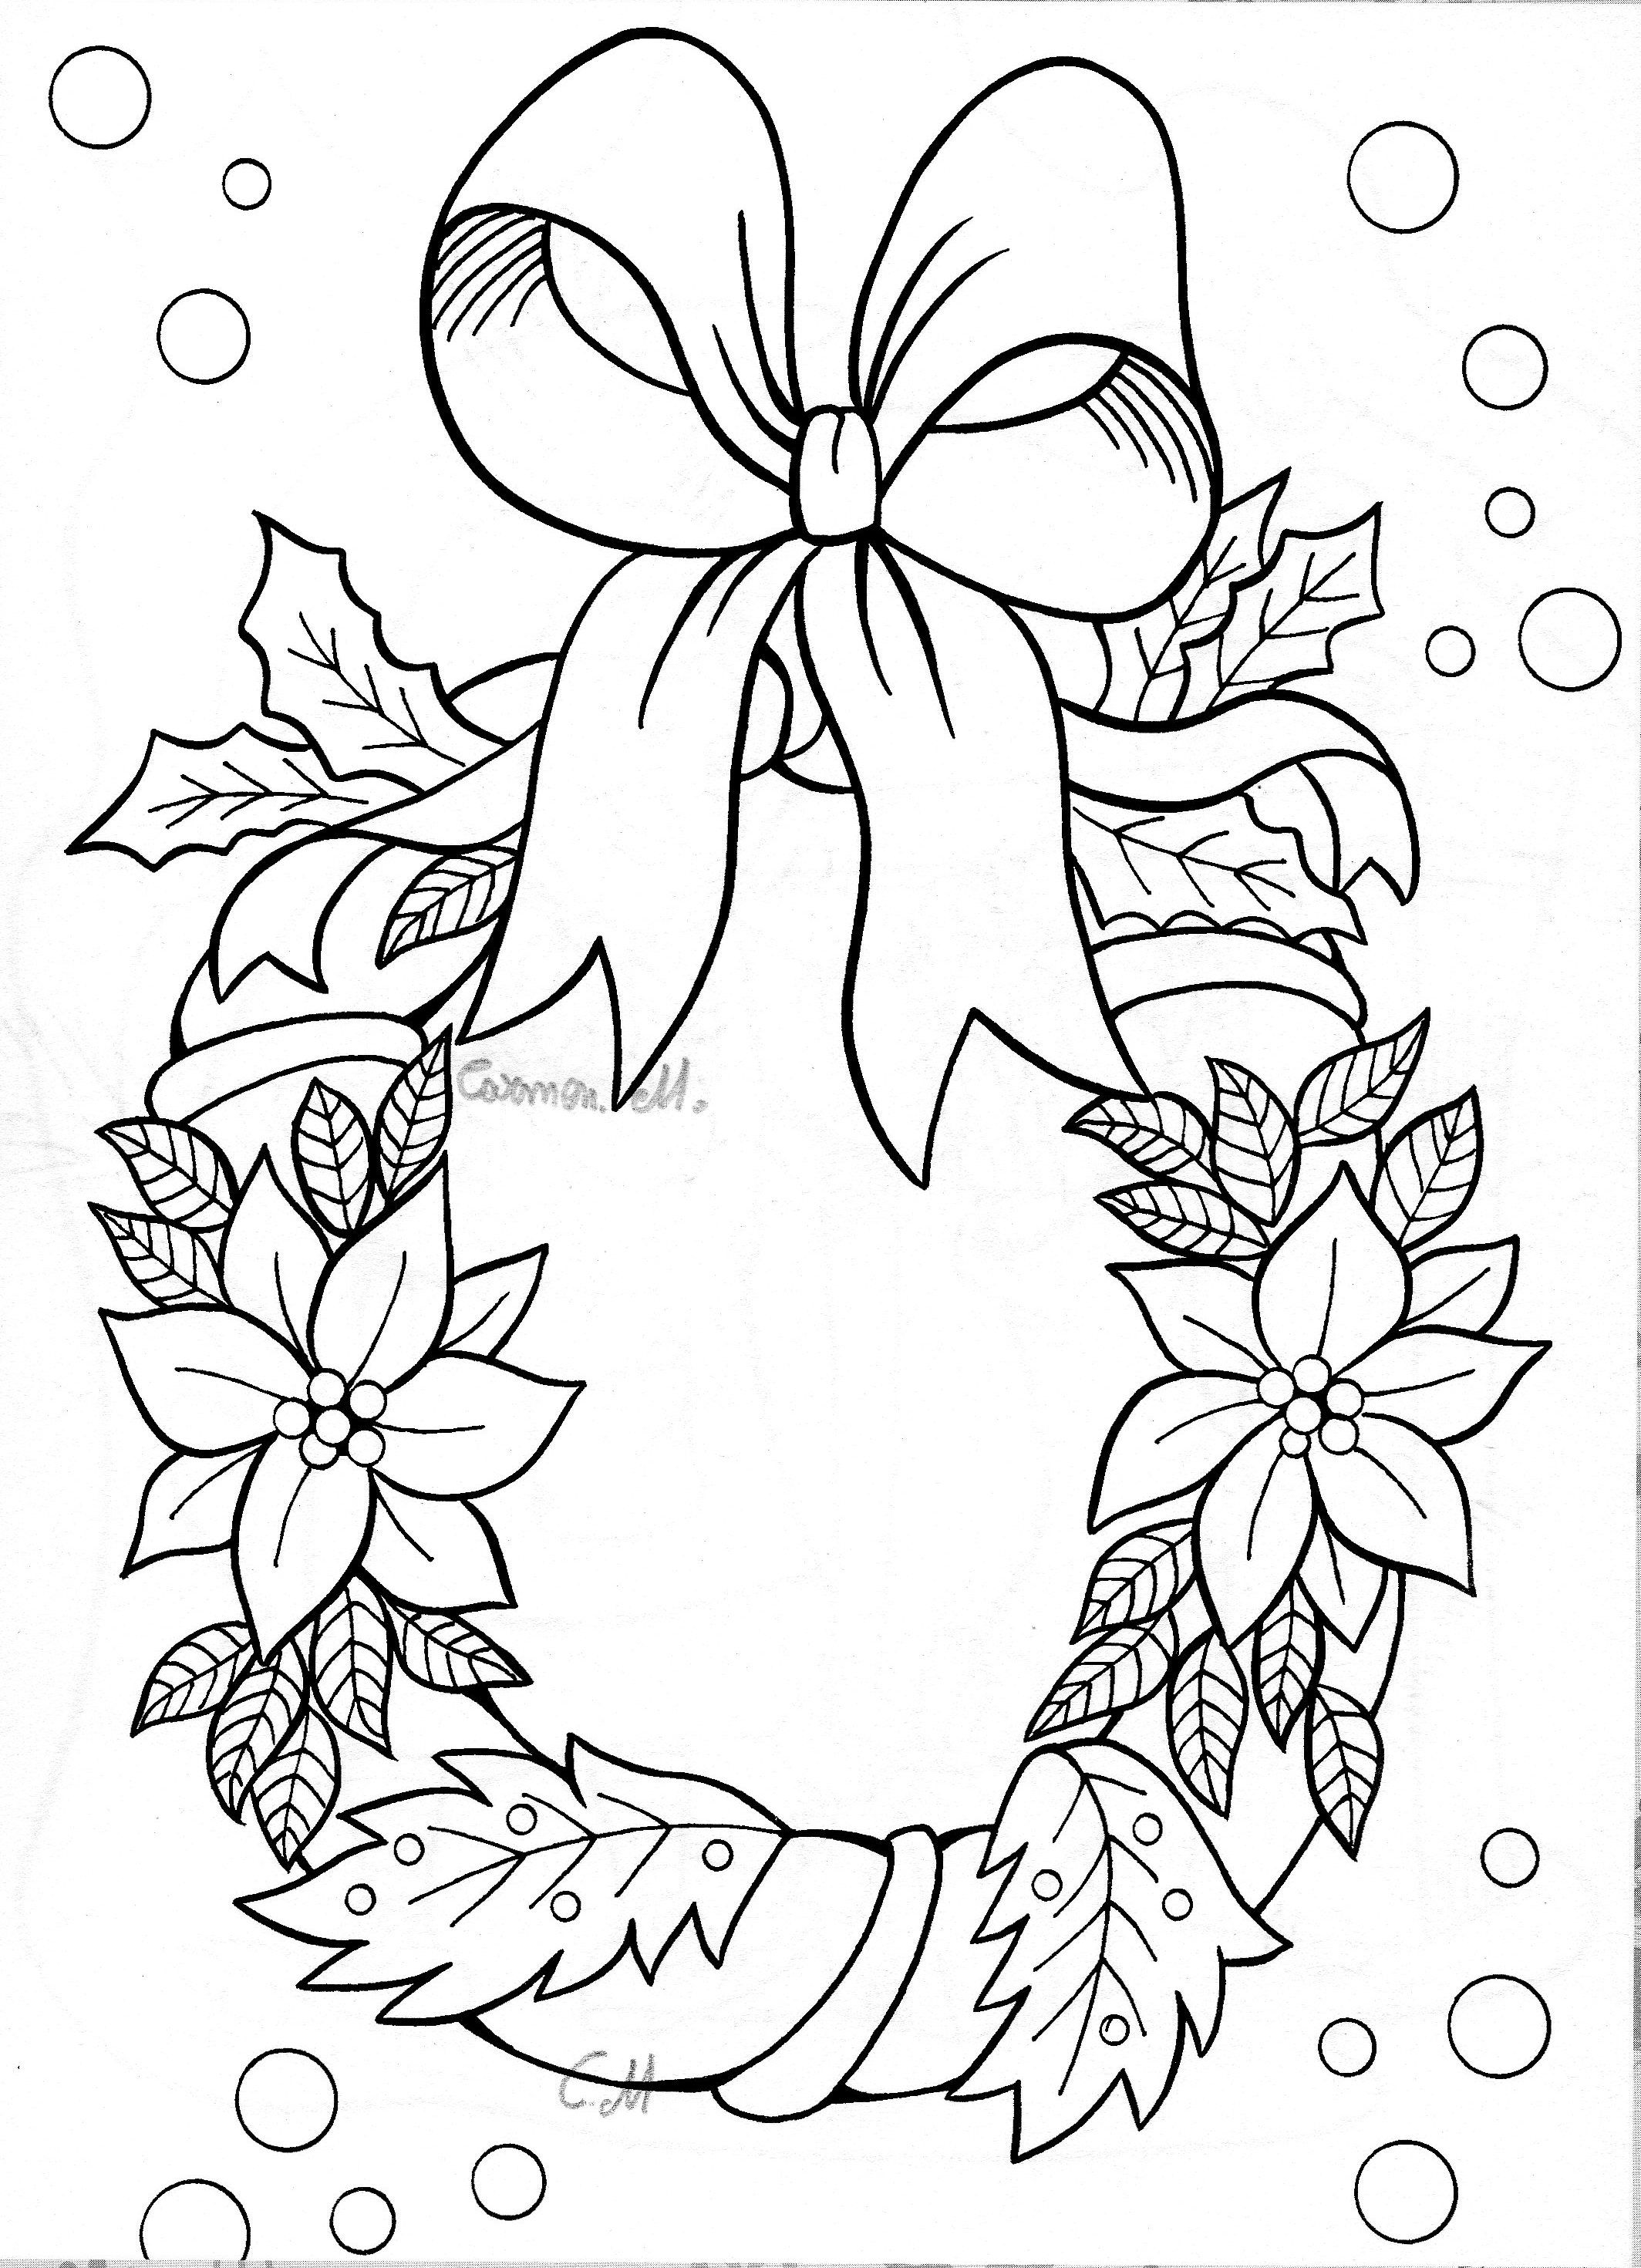 Pin de Iliana de Marroquin en flores para bordar | Pinterest ...